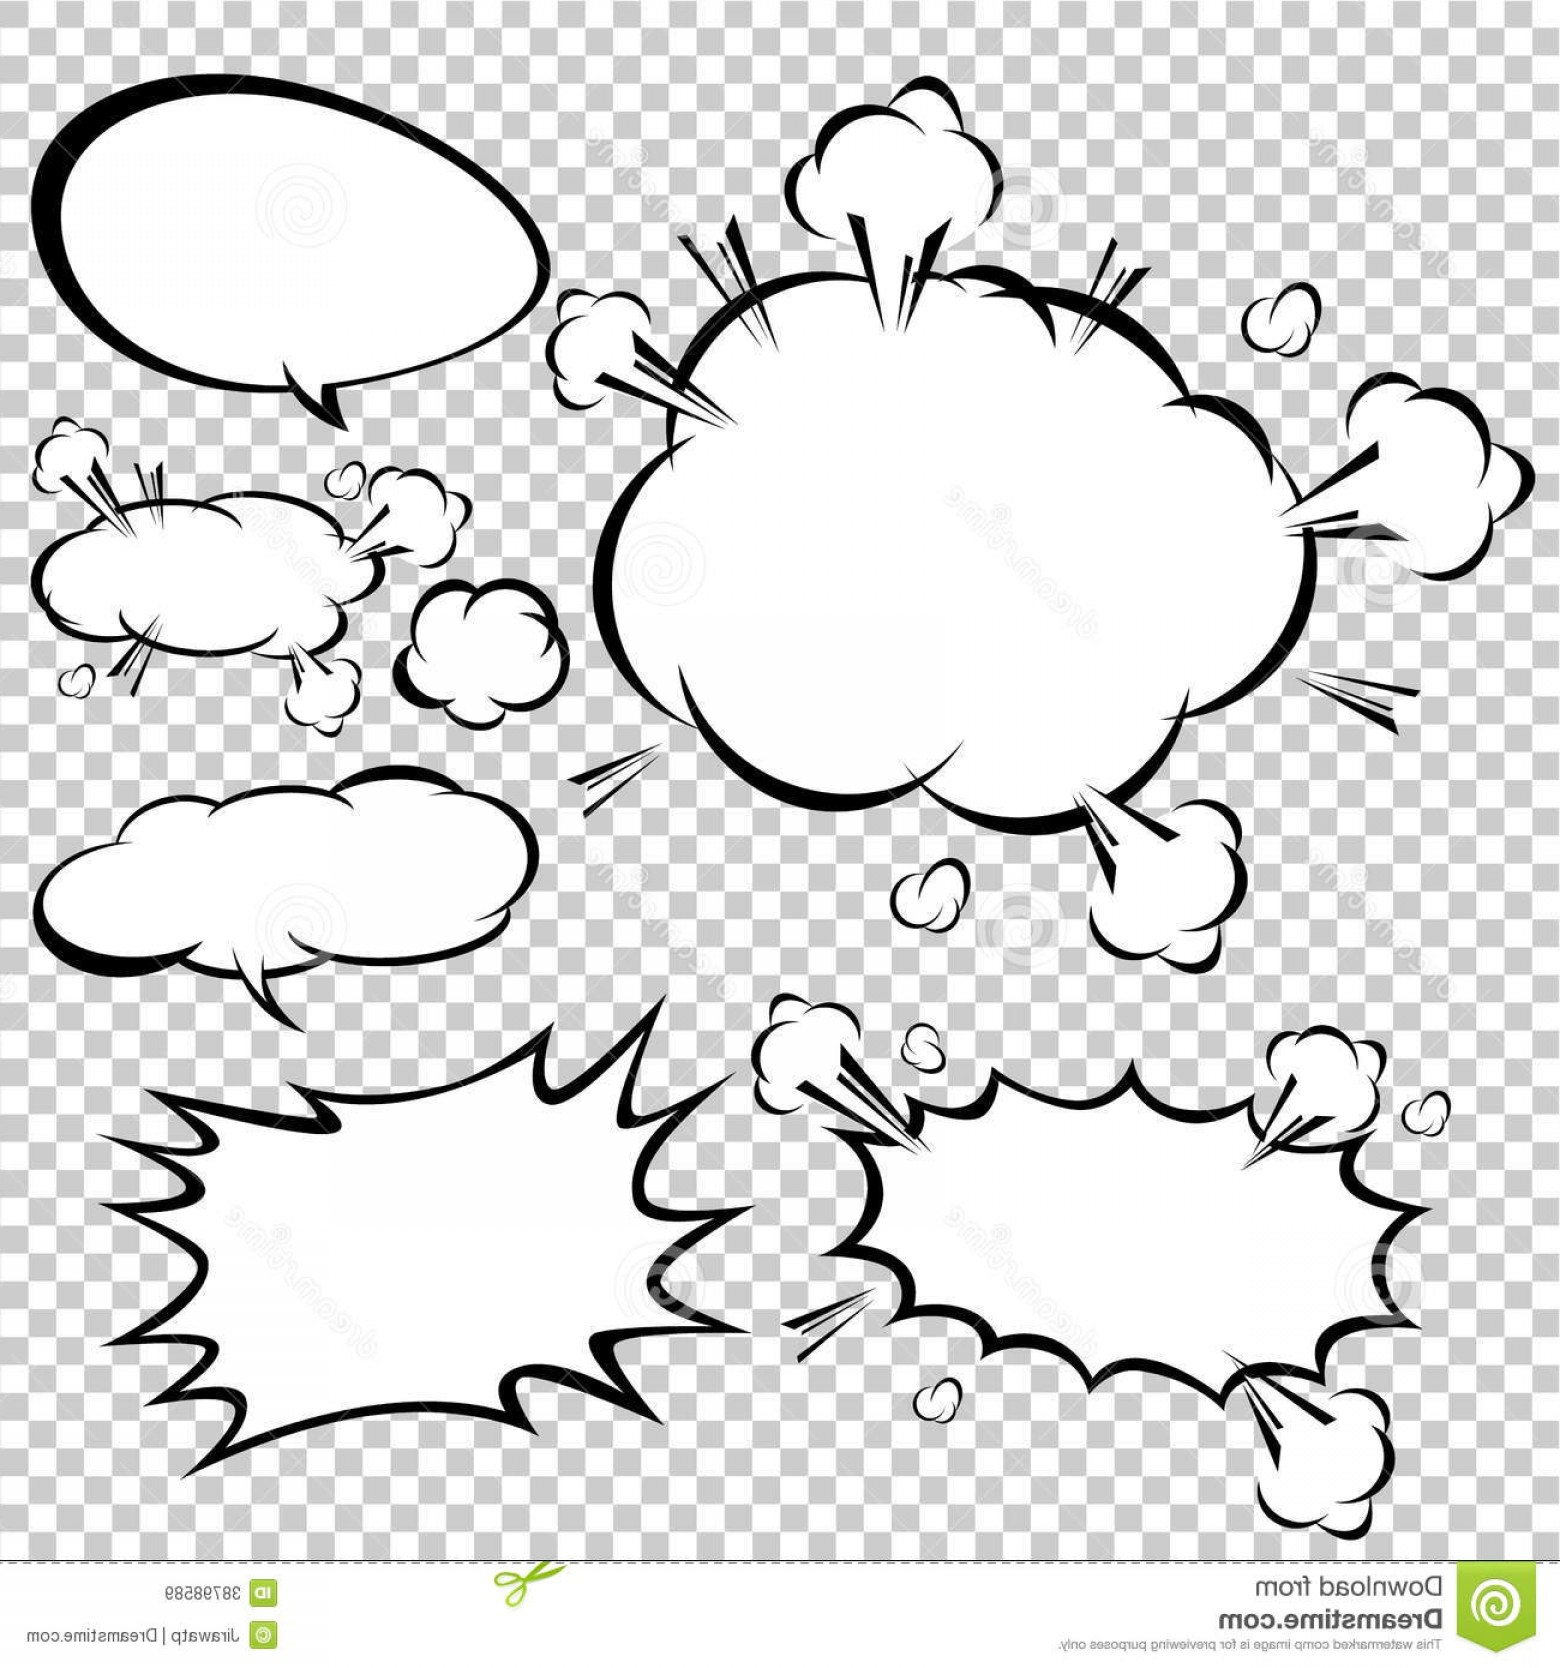 1560x1668 Comic Speech Bubbles Vector Illustration Illustration Shopatcloth